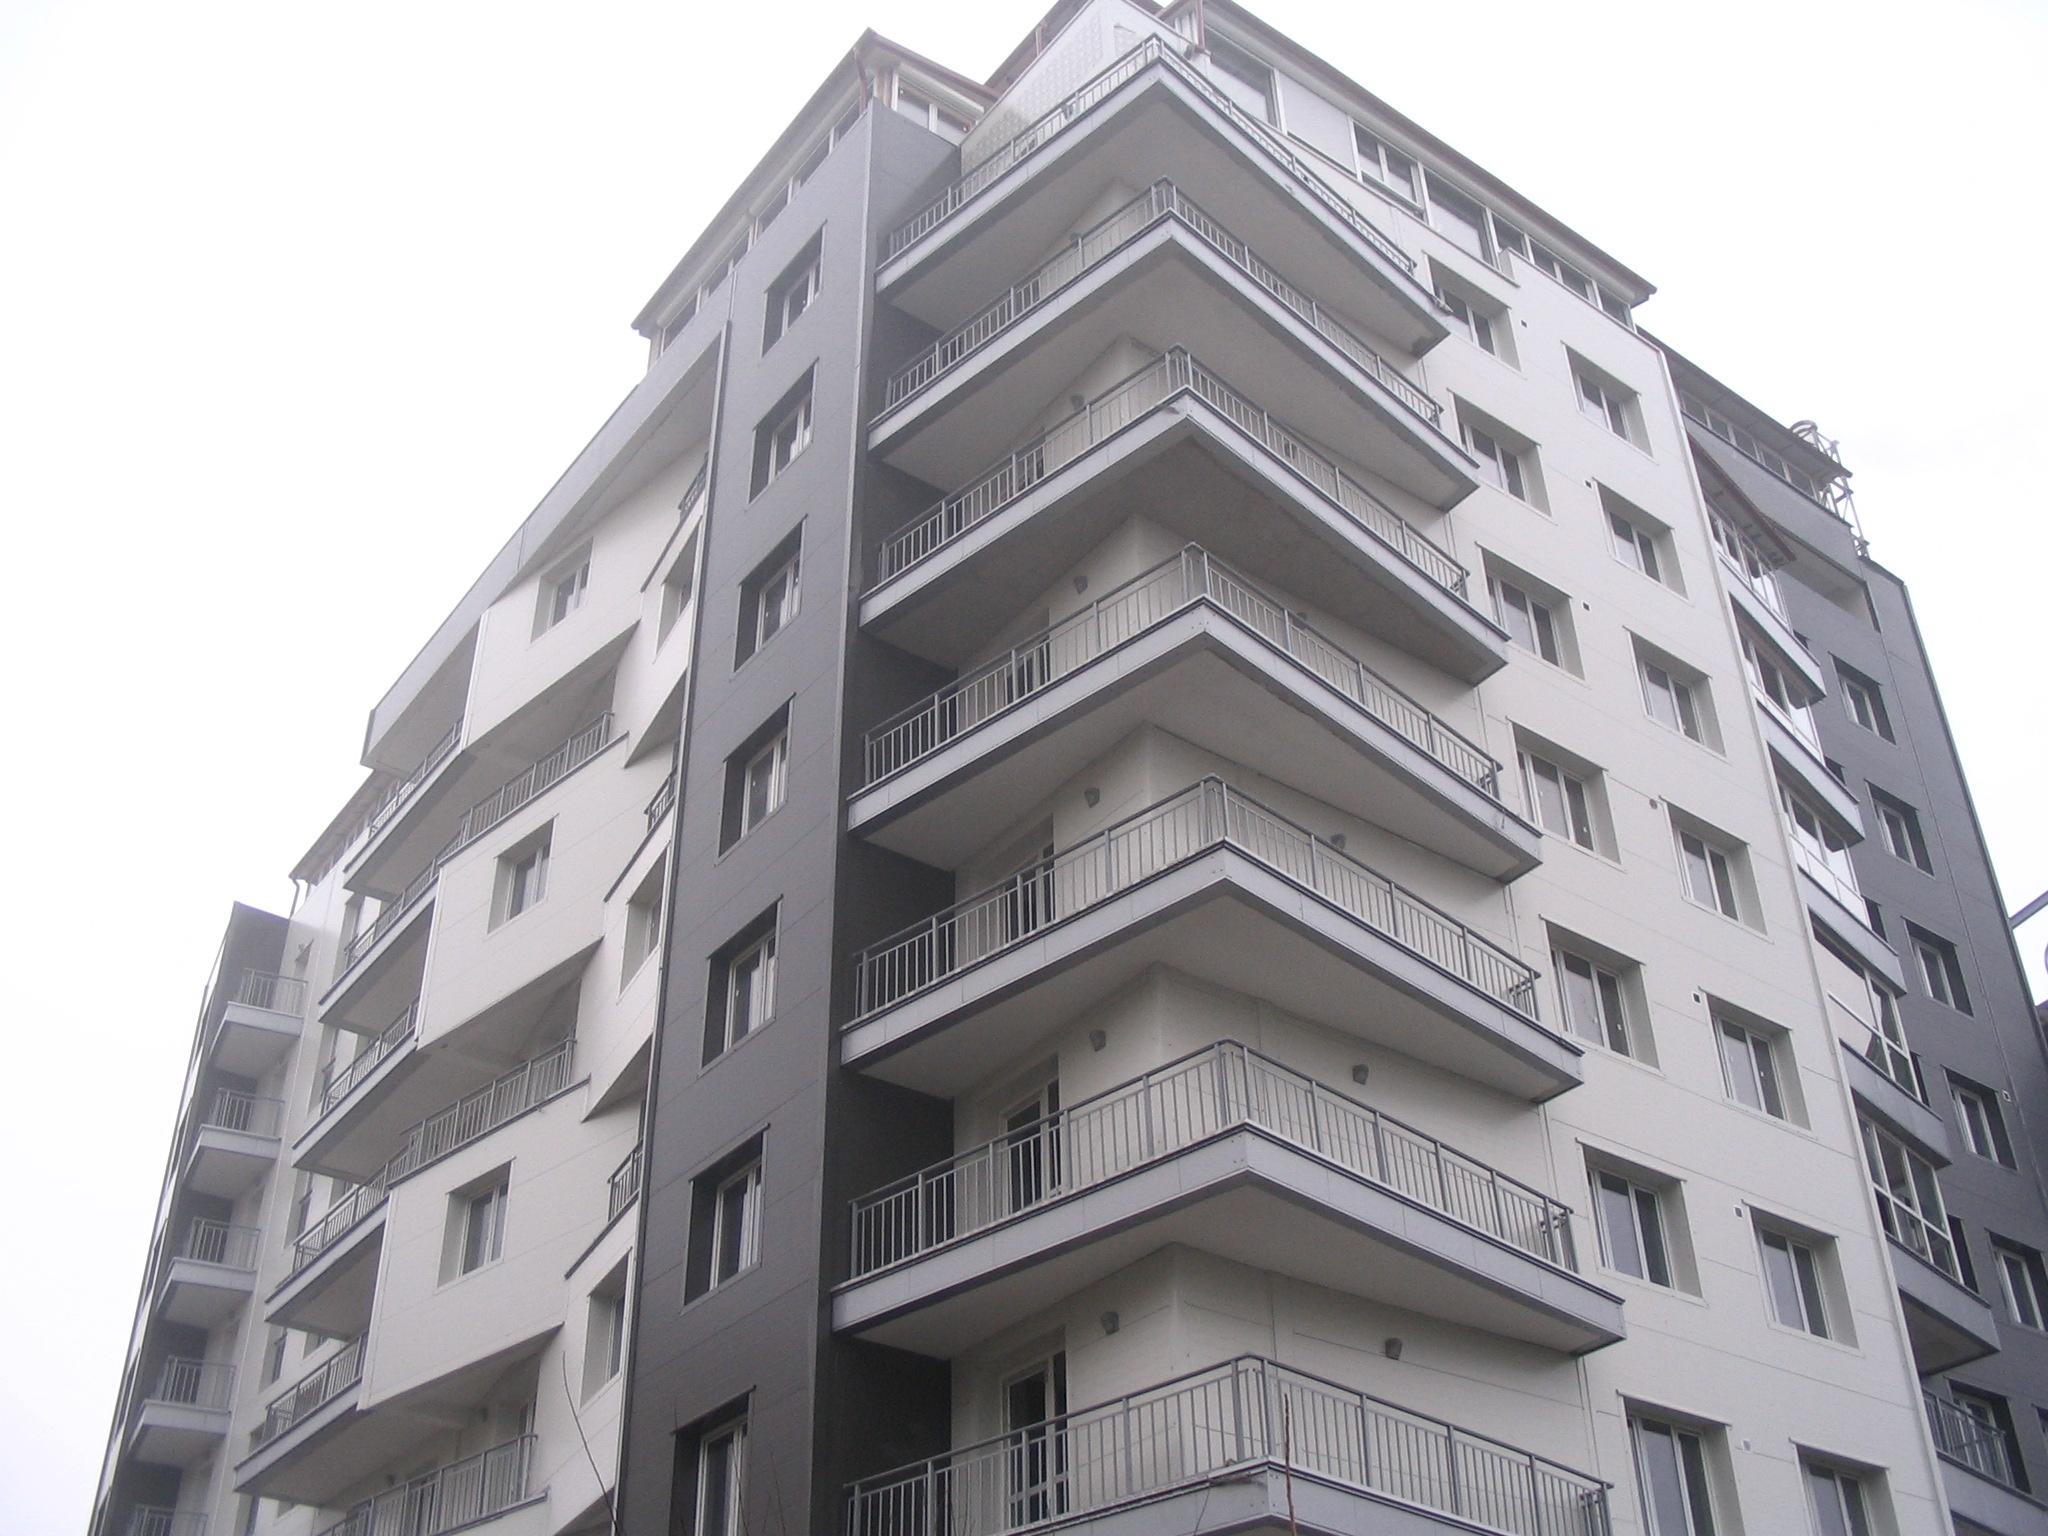 Ansamblu apartamente S+P+10 Str. Invingatorilor  - Poza 2